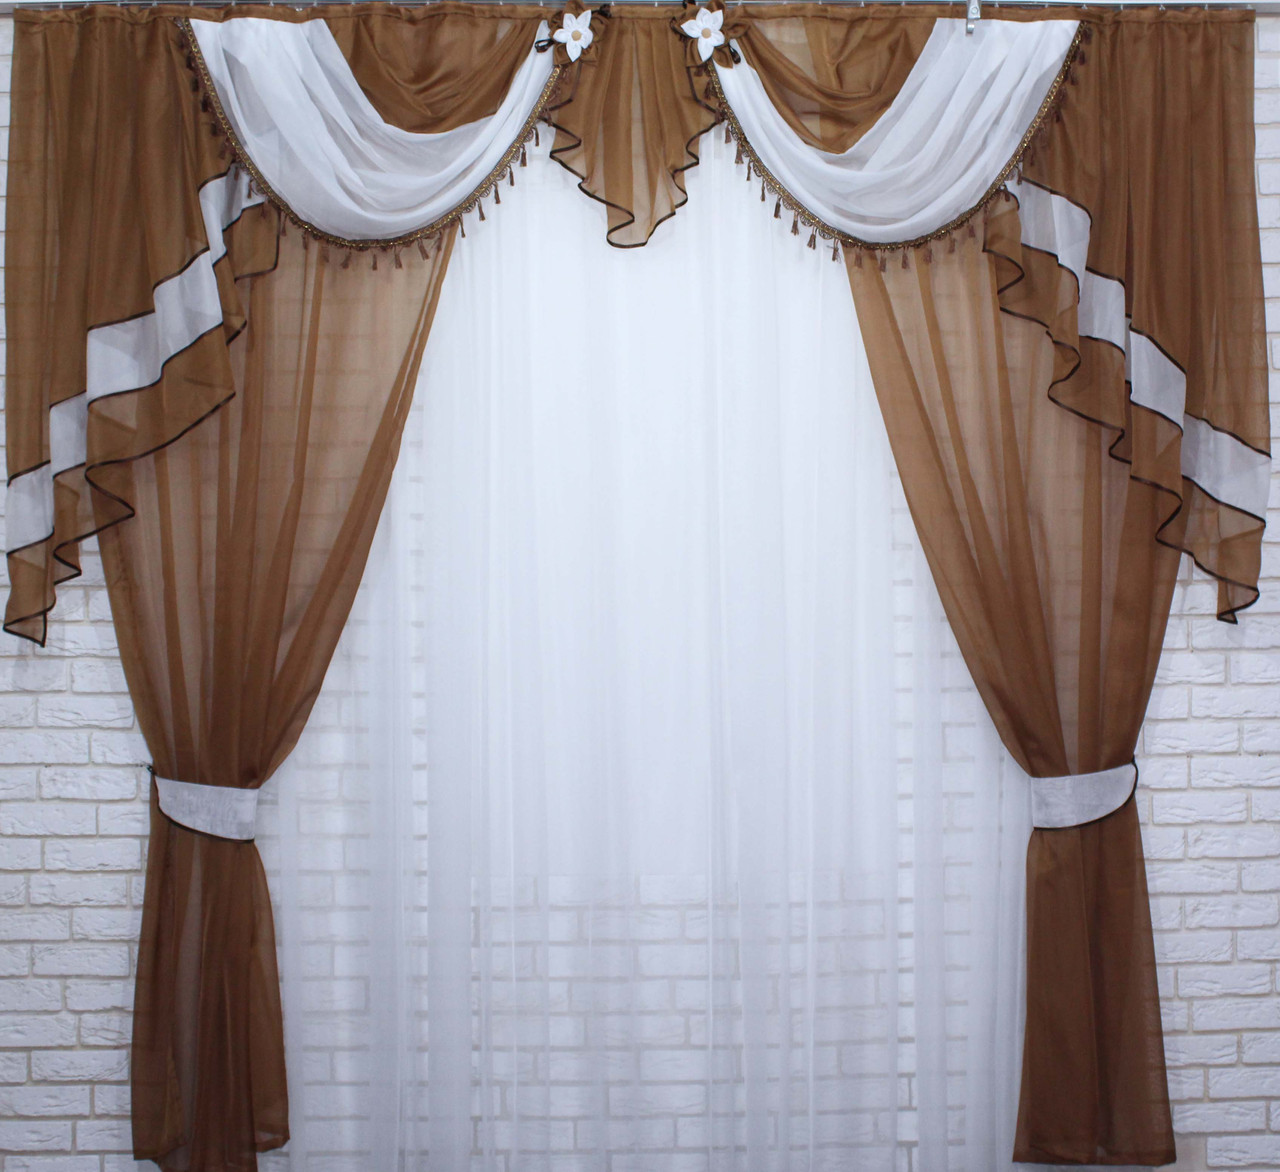 Комплект ламбрекен со шторами на карниз 3м. №28. Цвет коричневый с белым.